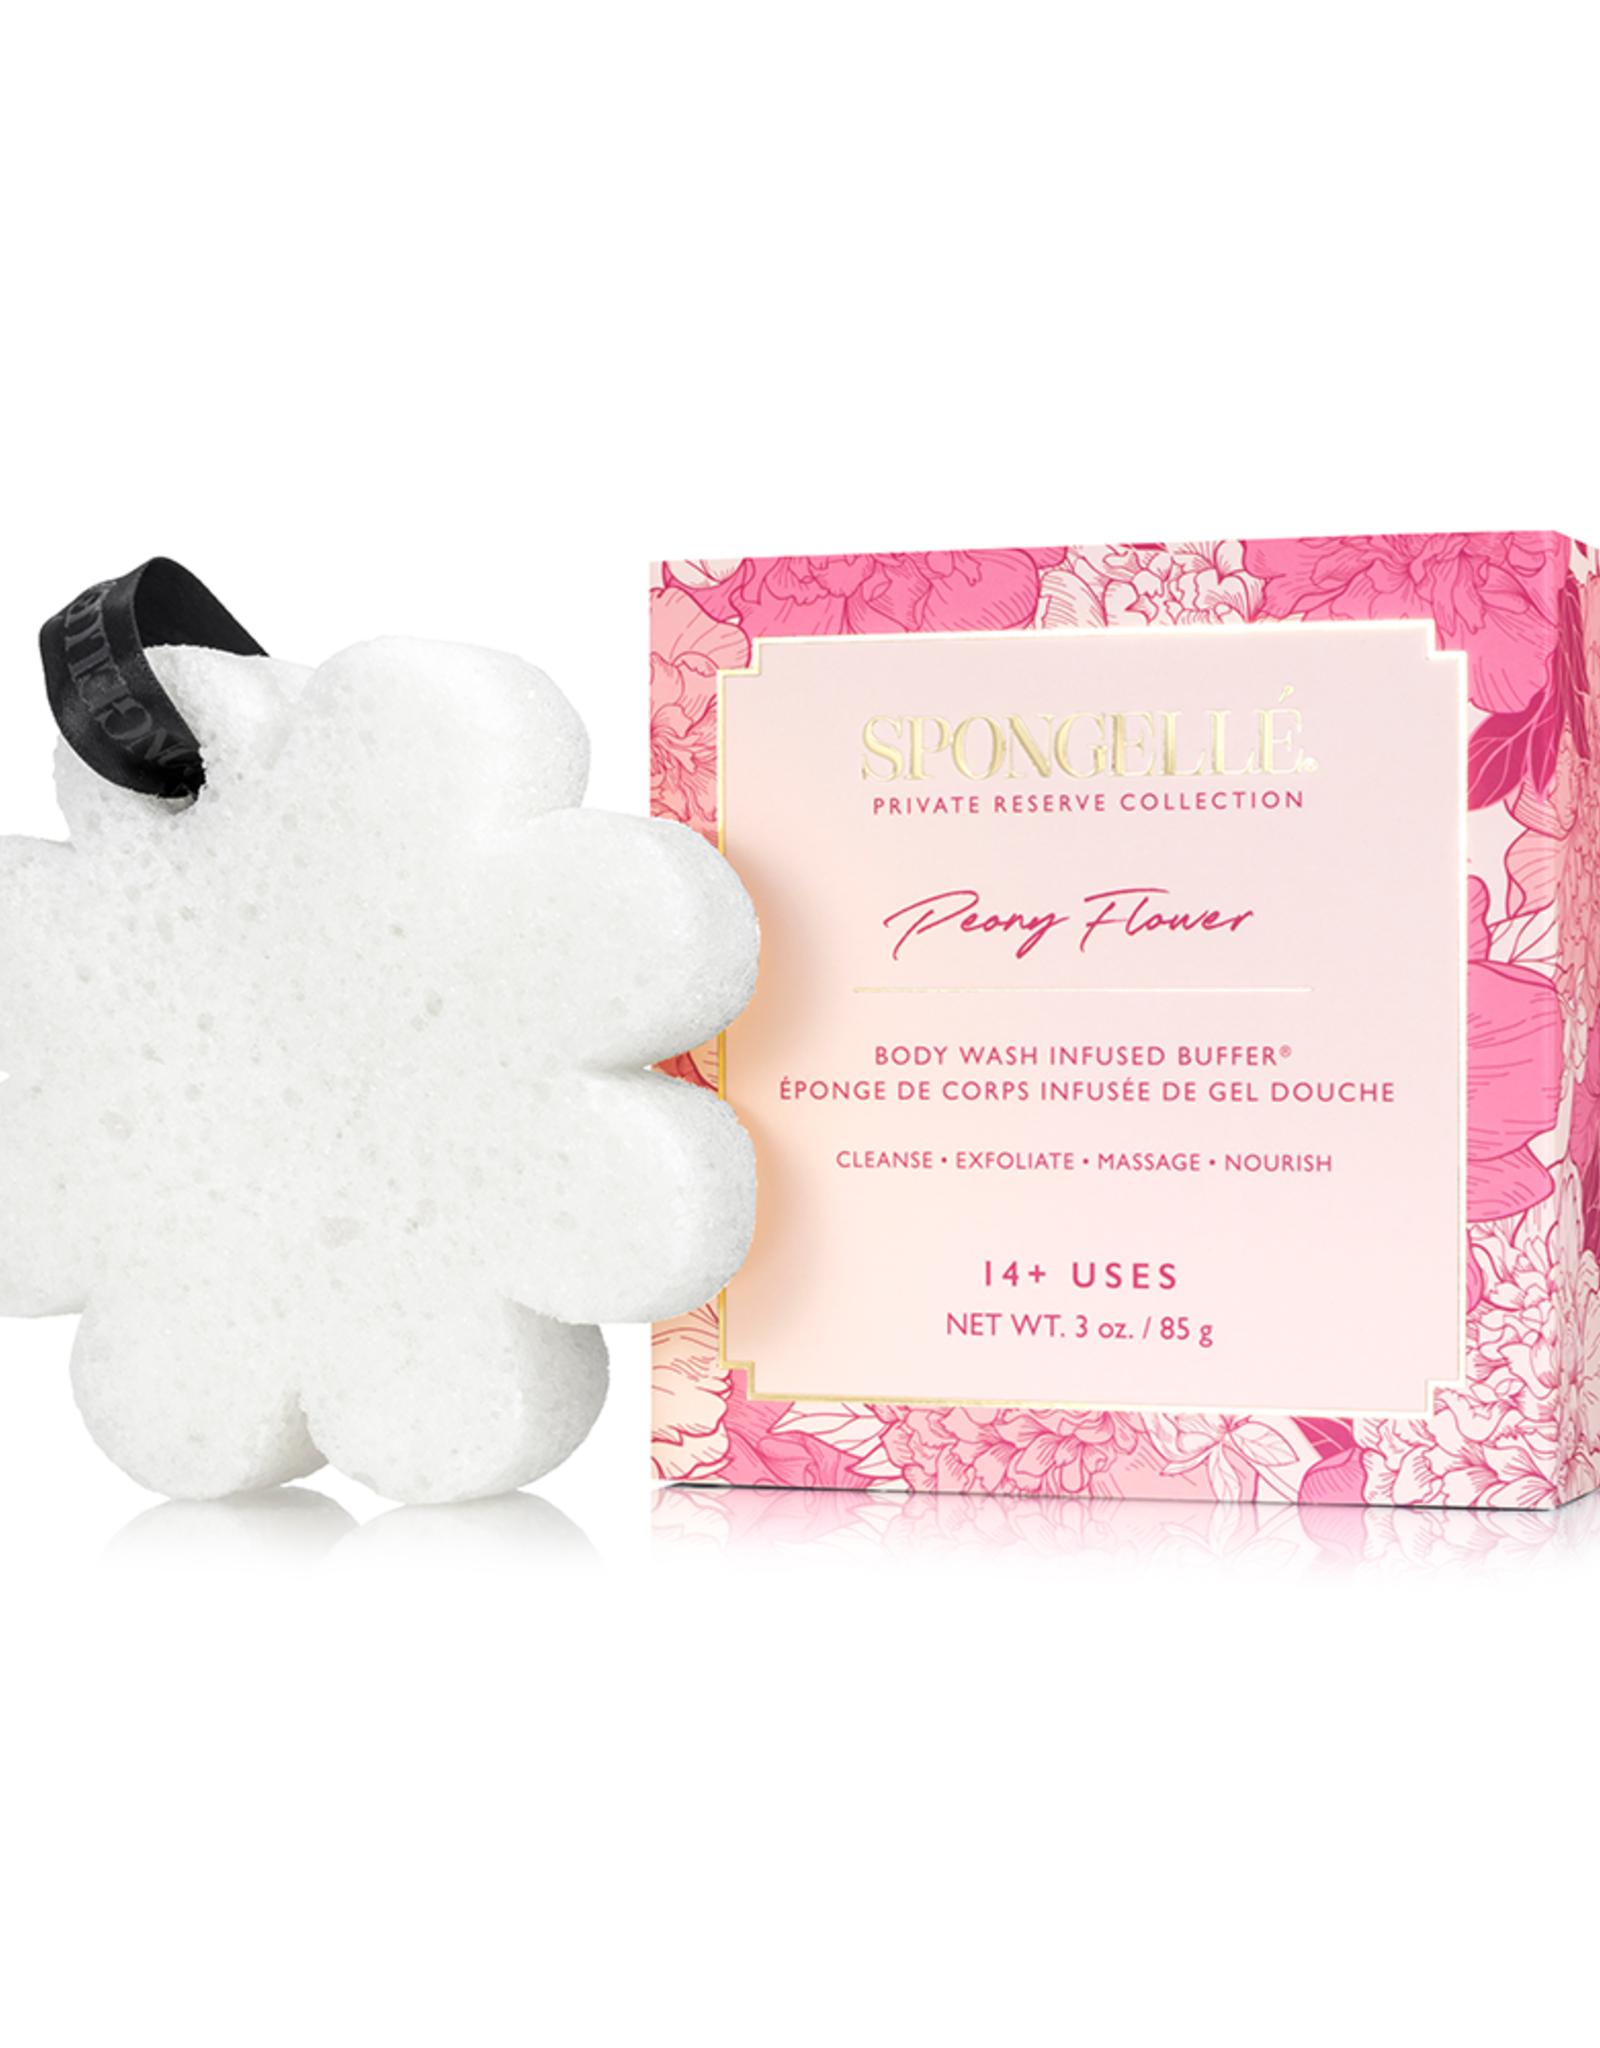 Spongelle Peony Flower | Boxed Flower